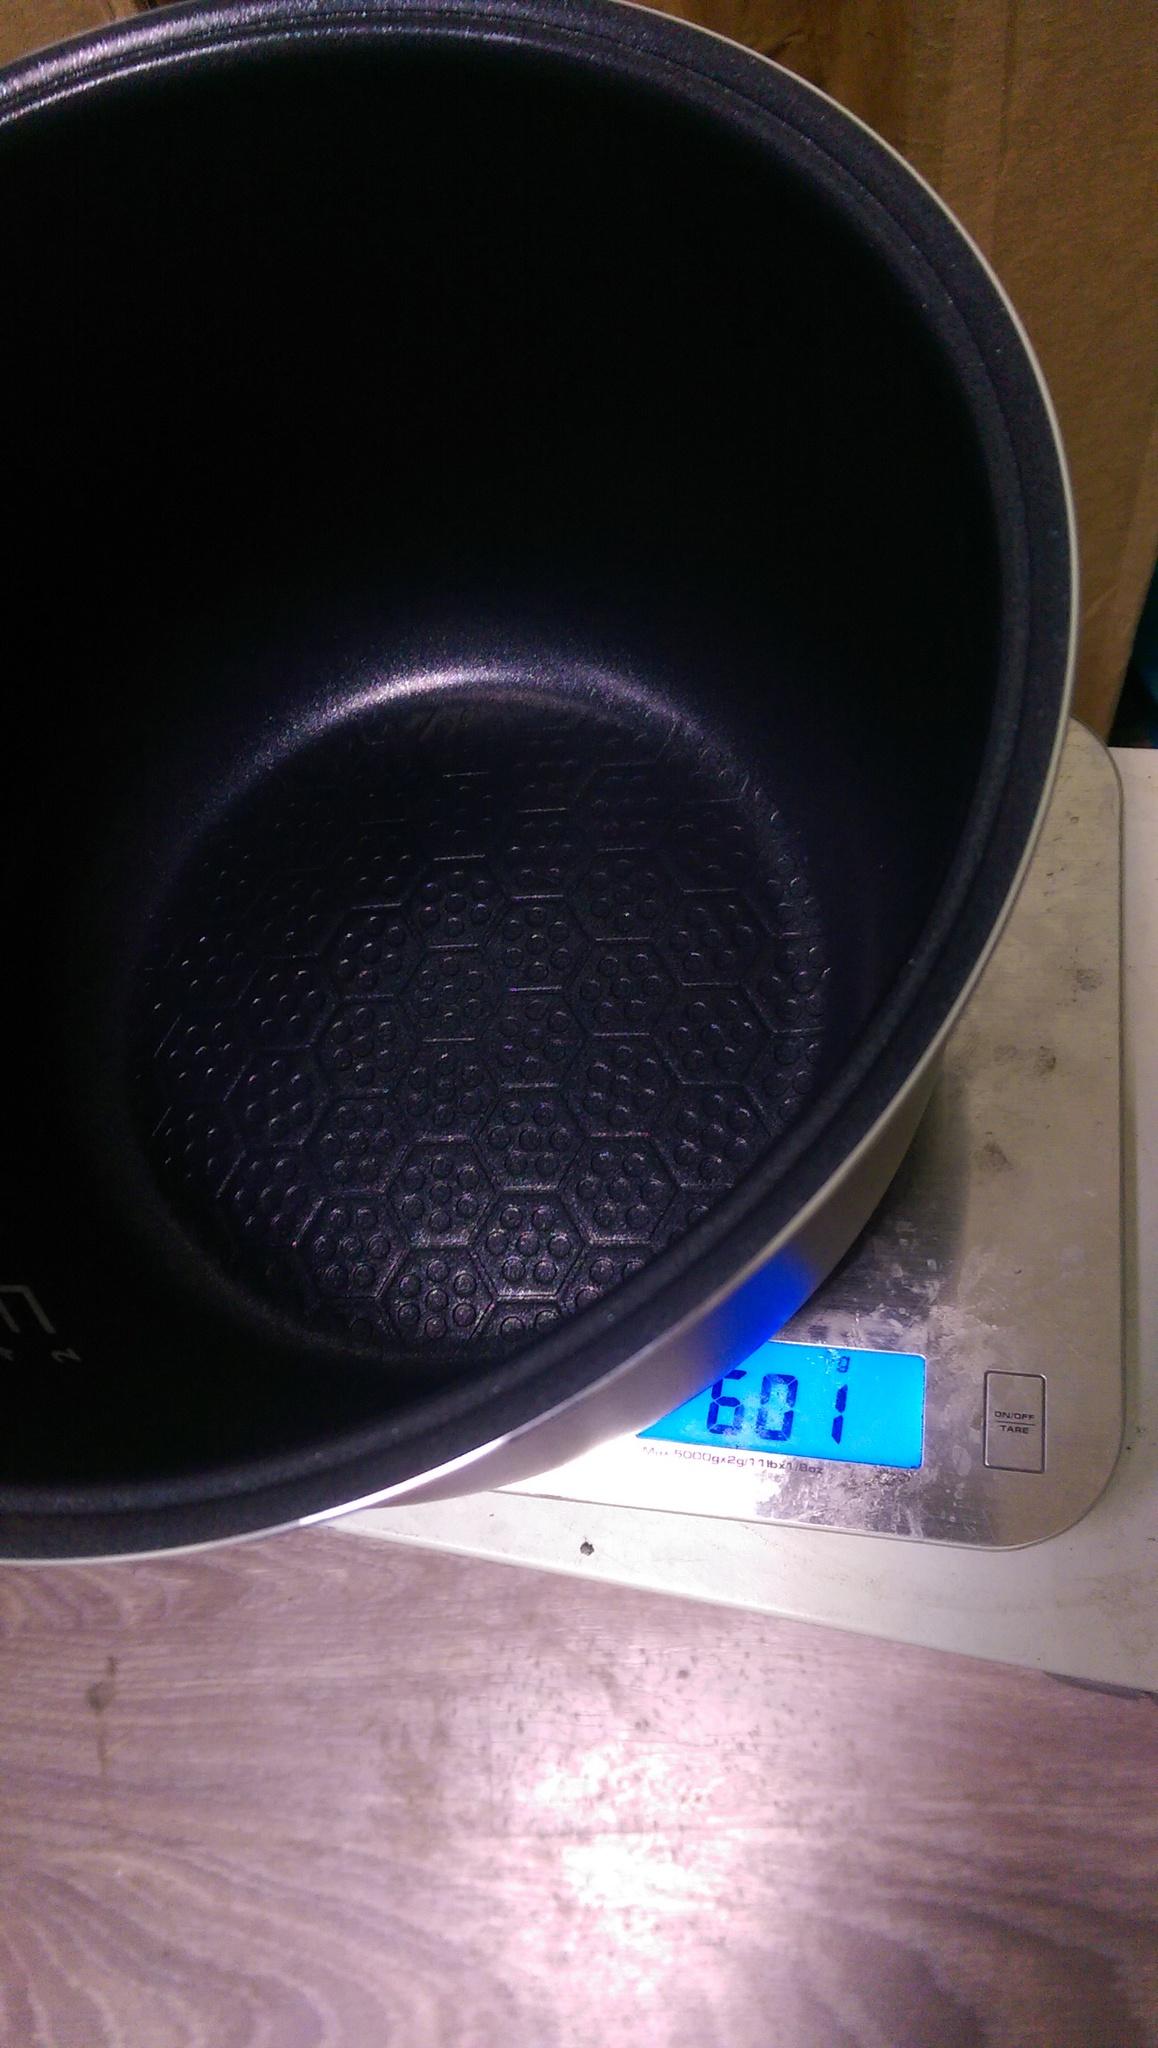 Мультиварка Mystery MCM-1010 Вес чаши составляет 600 грамм